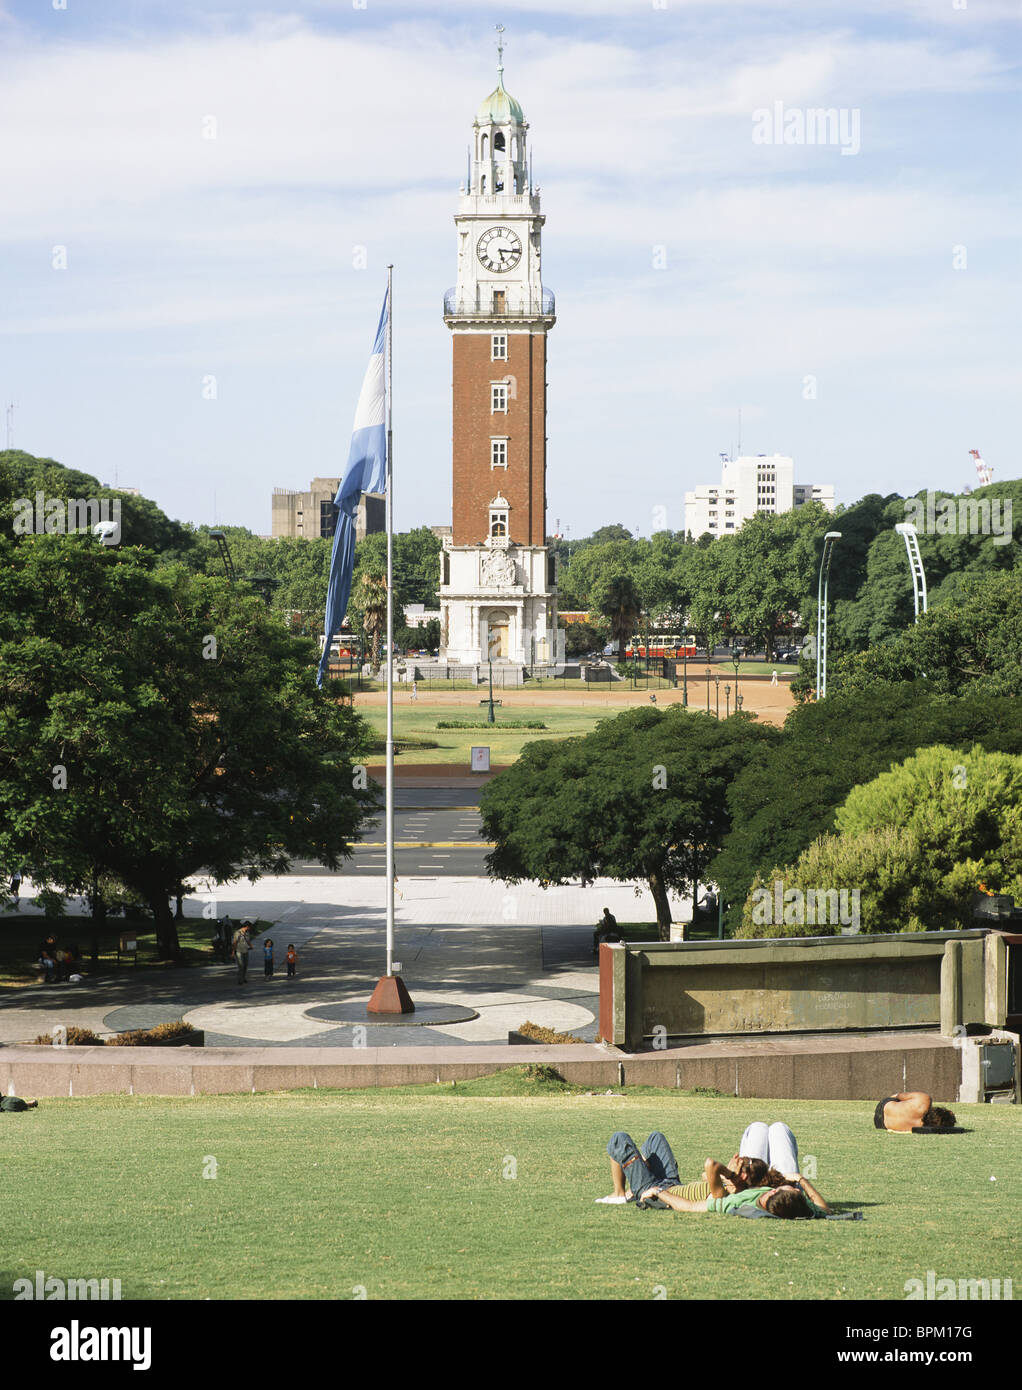 Plaza San Martin, Buenos Aires, Argentina - Stock Image